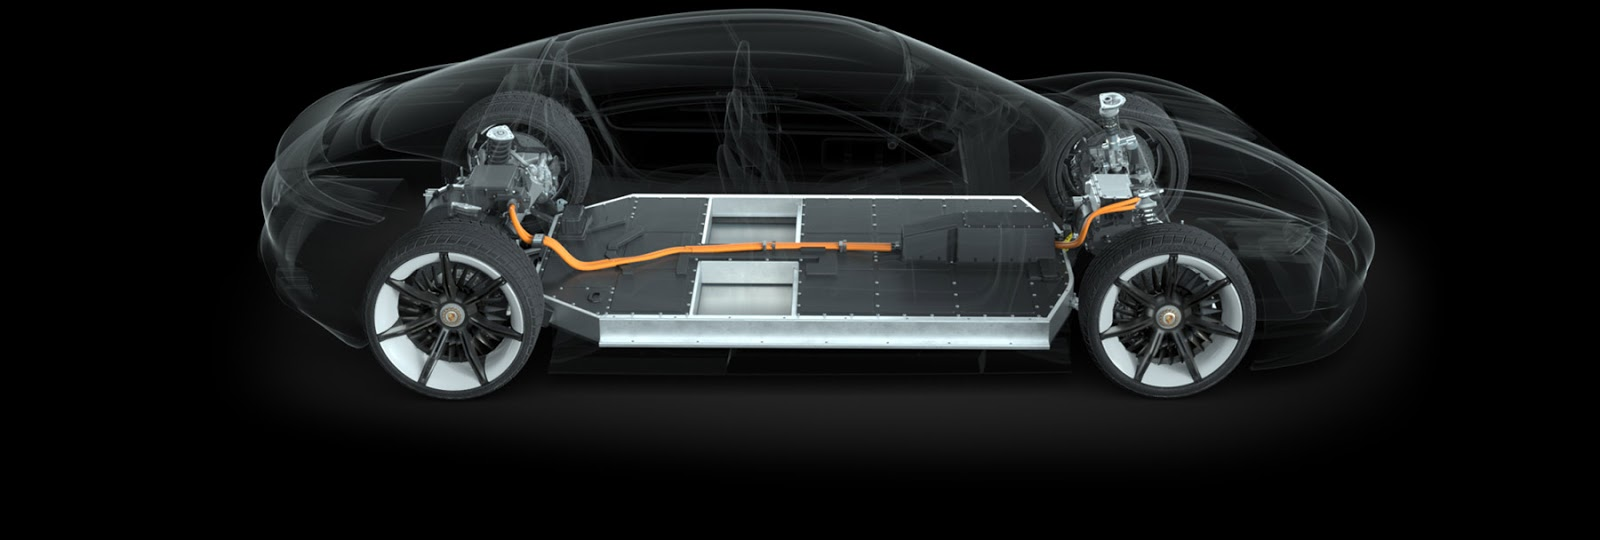 clip 17 Σε τρία χρόνια το πρώτο αποκλειστικά ηλεκτροκίνητο μοντέλο της Porsche Electric cars, Porsche, Porsche 919, Porsche Mission E, supercars, videos, Τεχνολογία